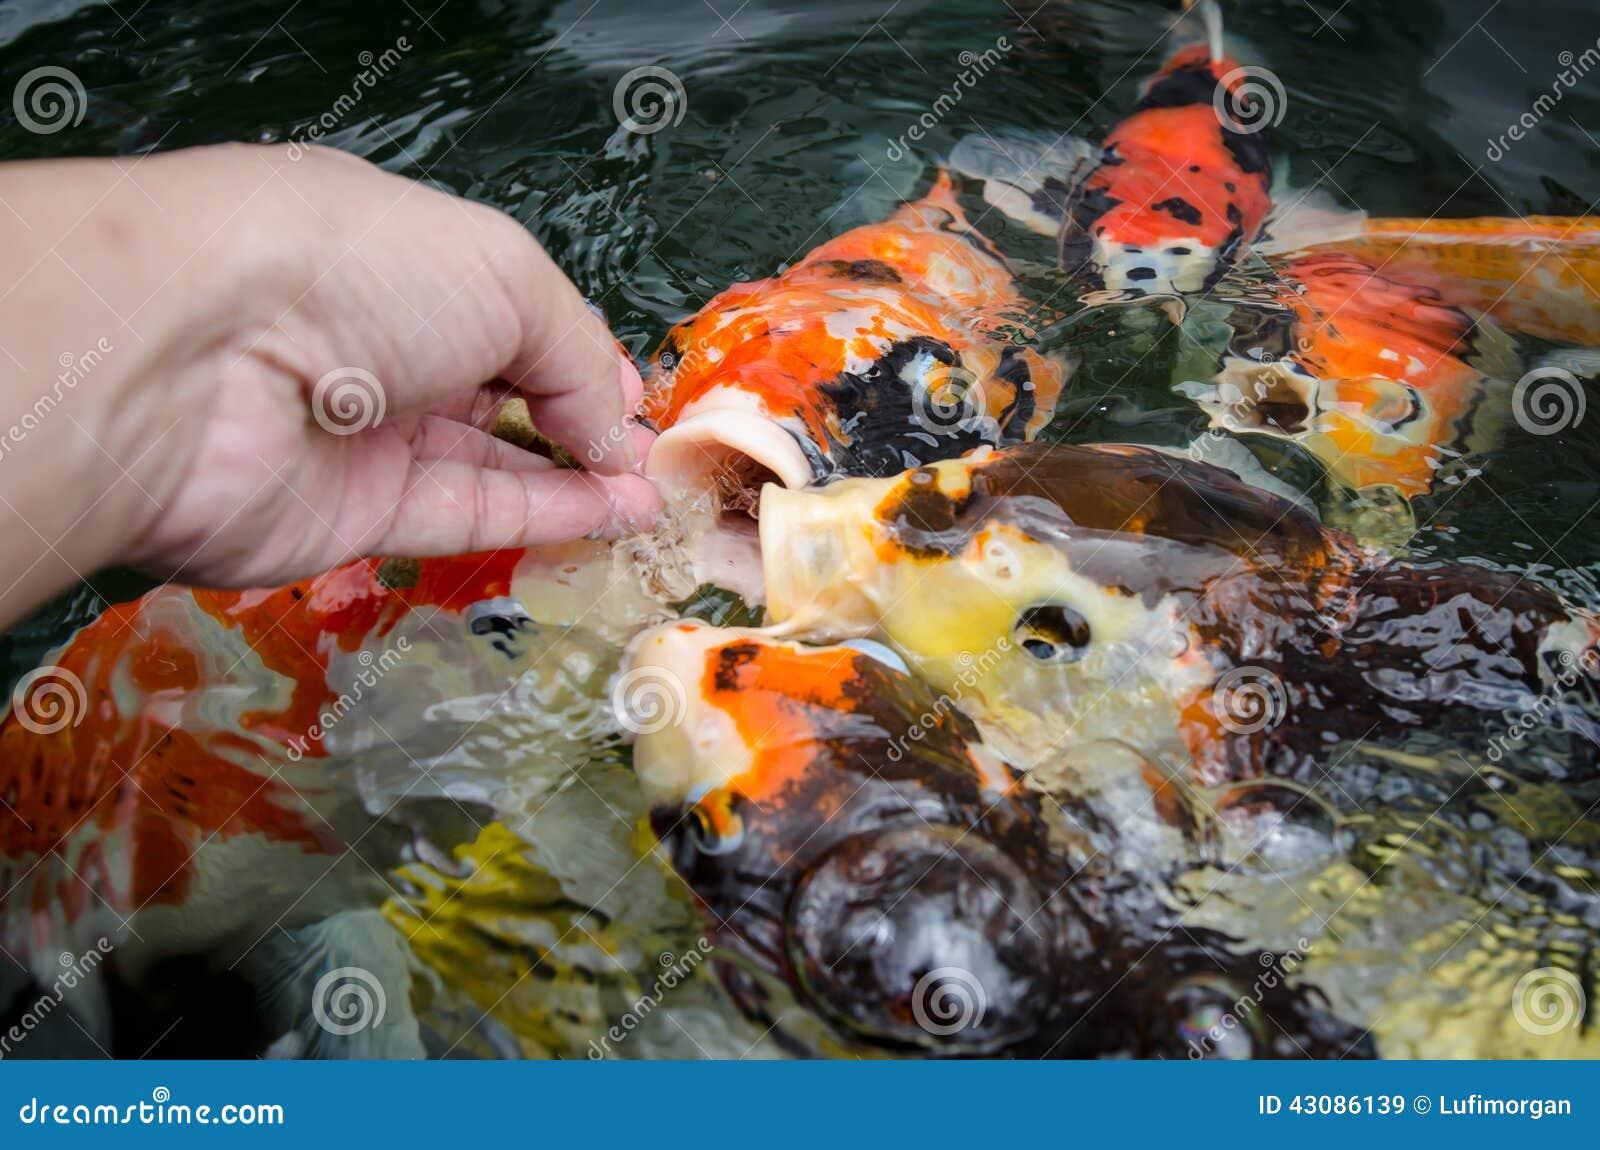 Feeding carp by hand stock photo image 43086139 for What to feed koi carp